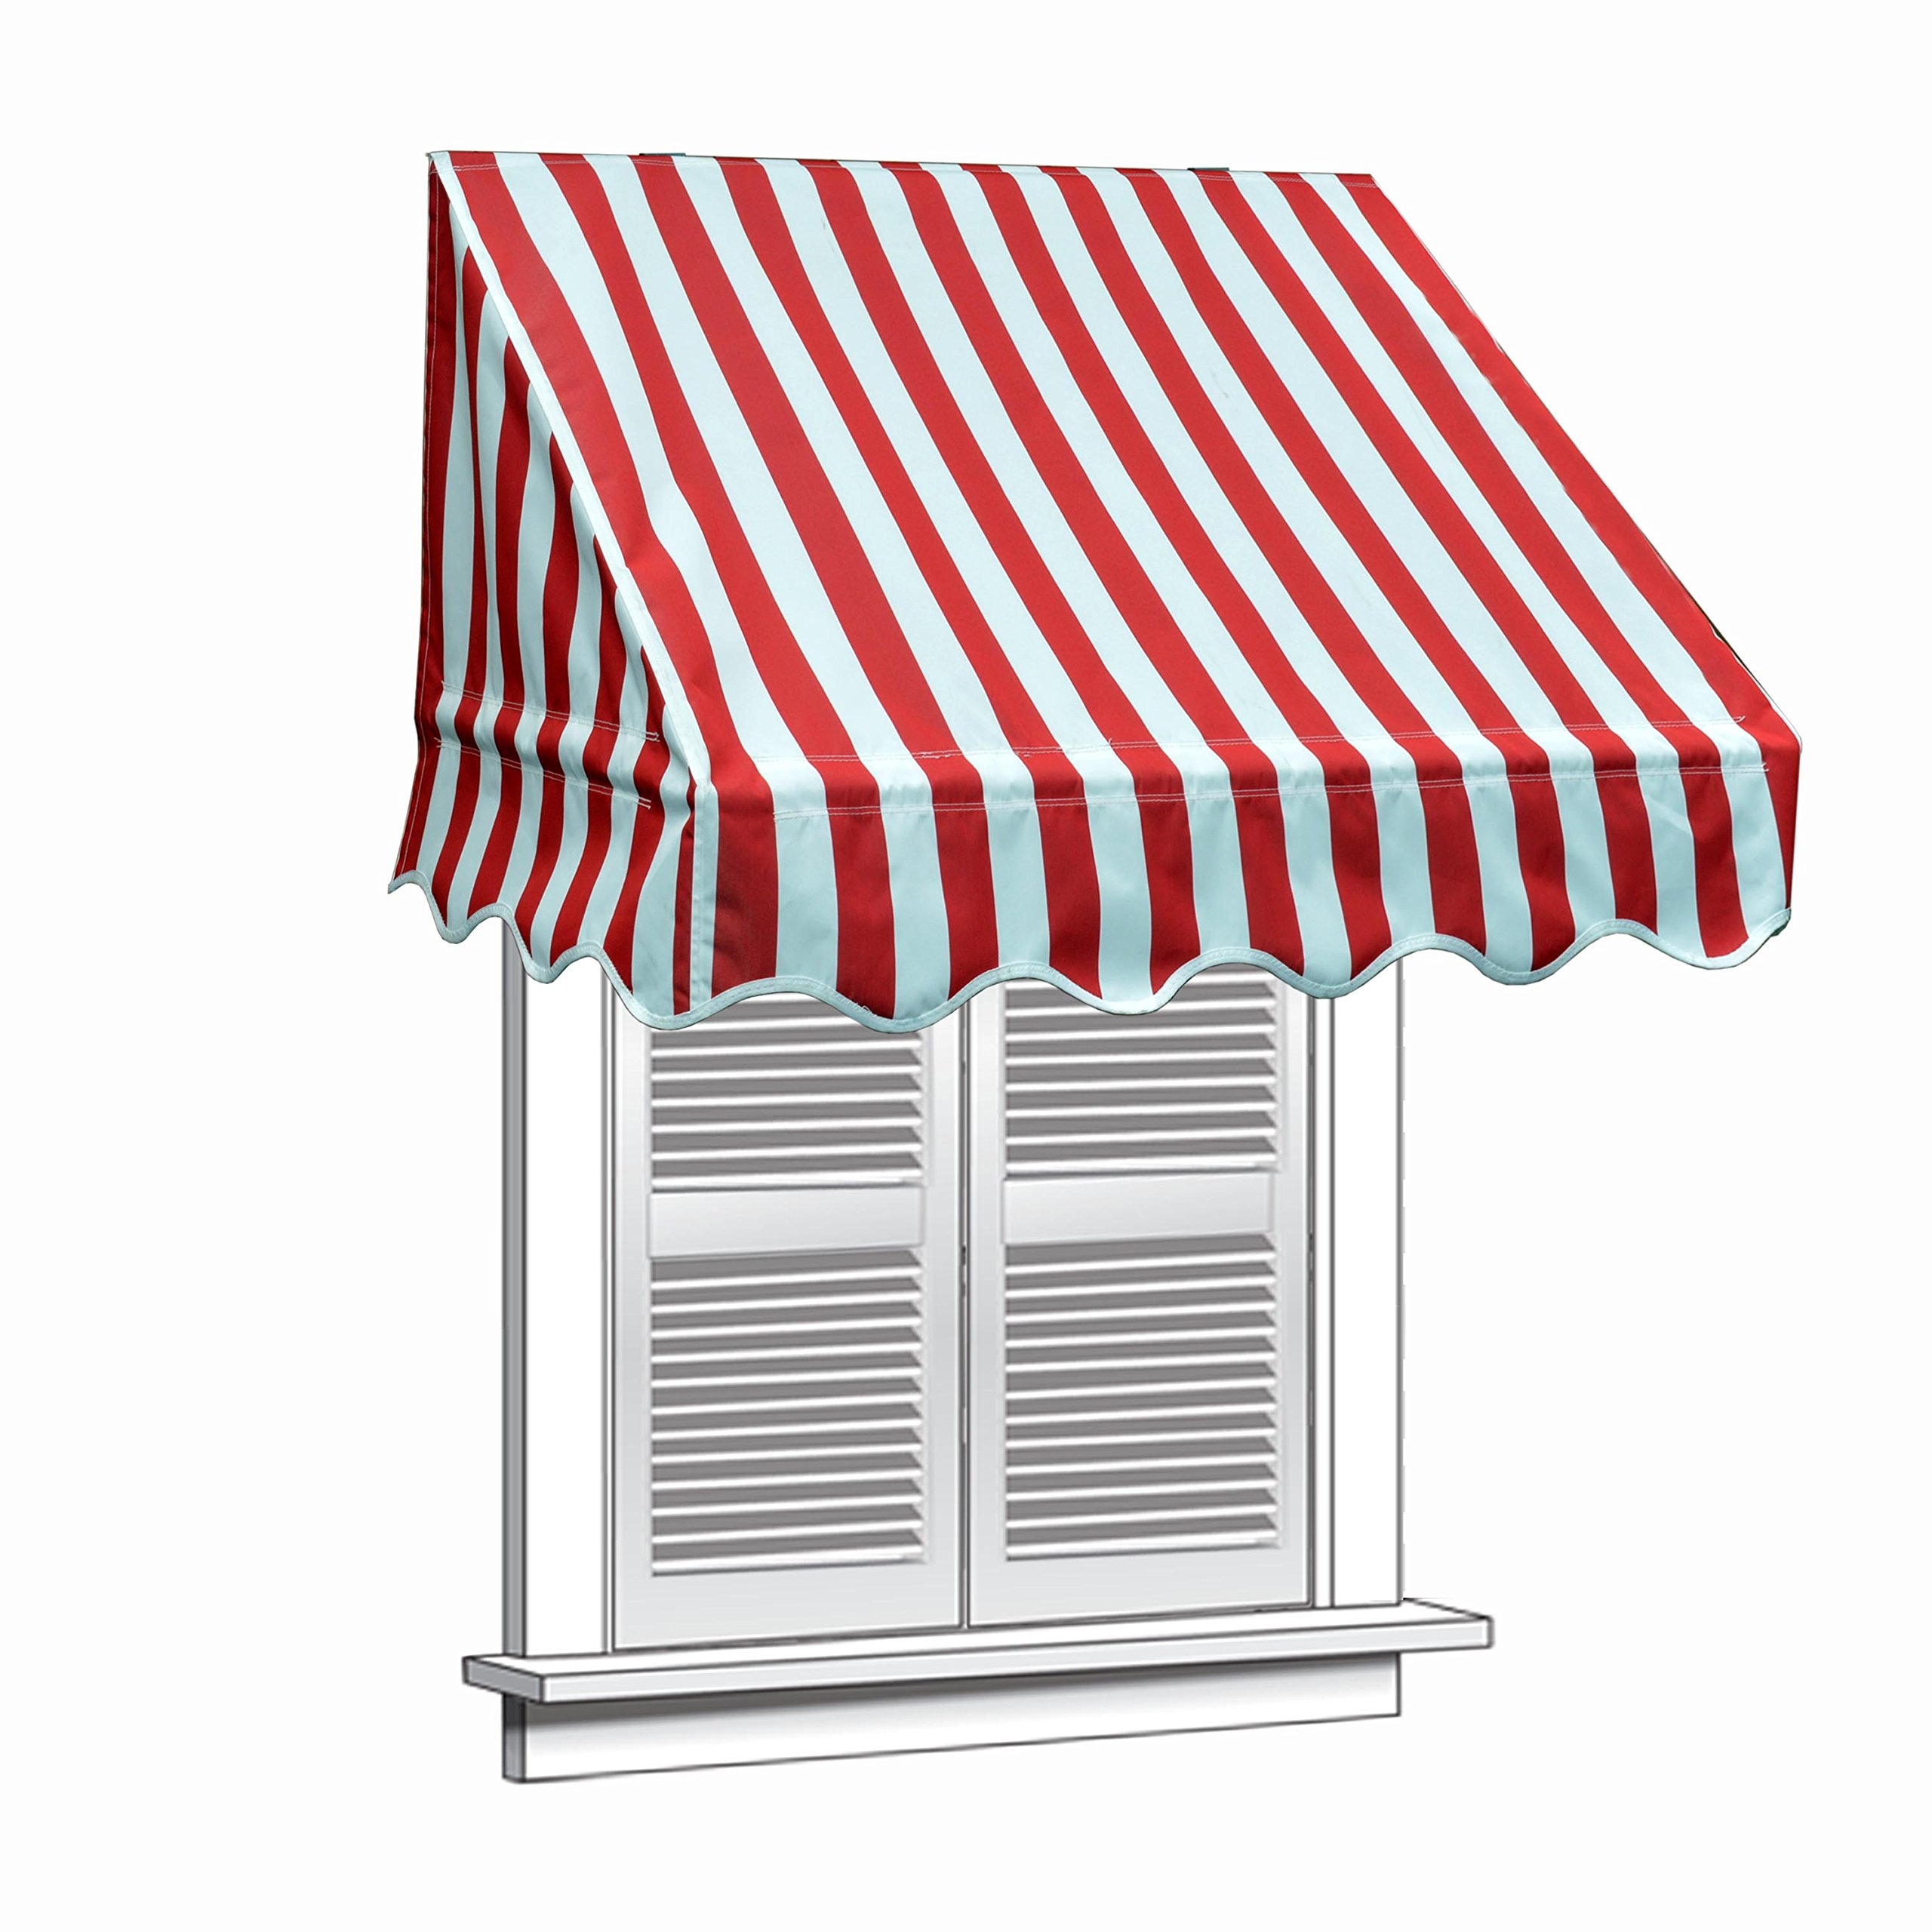 ALEKO 4x2 Feet Multiple Stripes Red Window Awning Door Canopy 4-Foot Decorator Awning by ALEKO